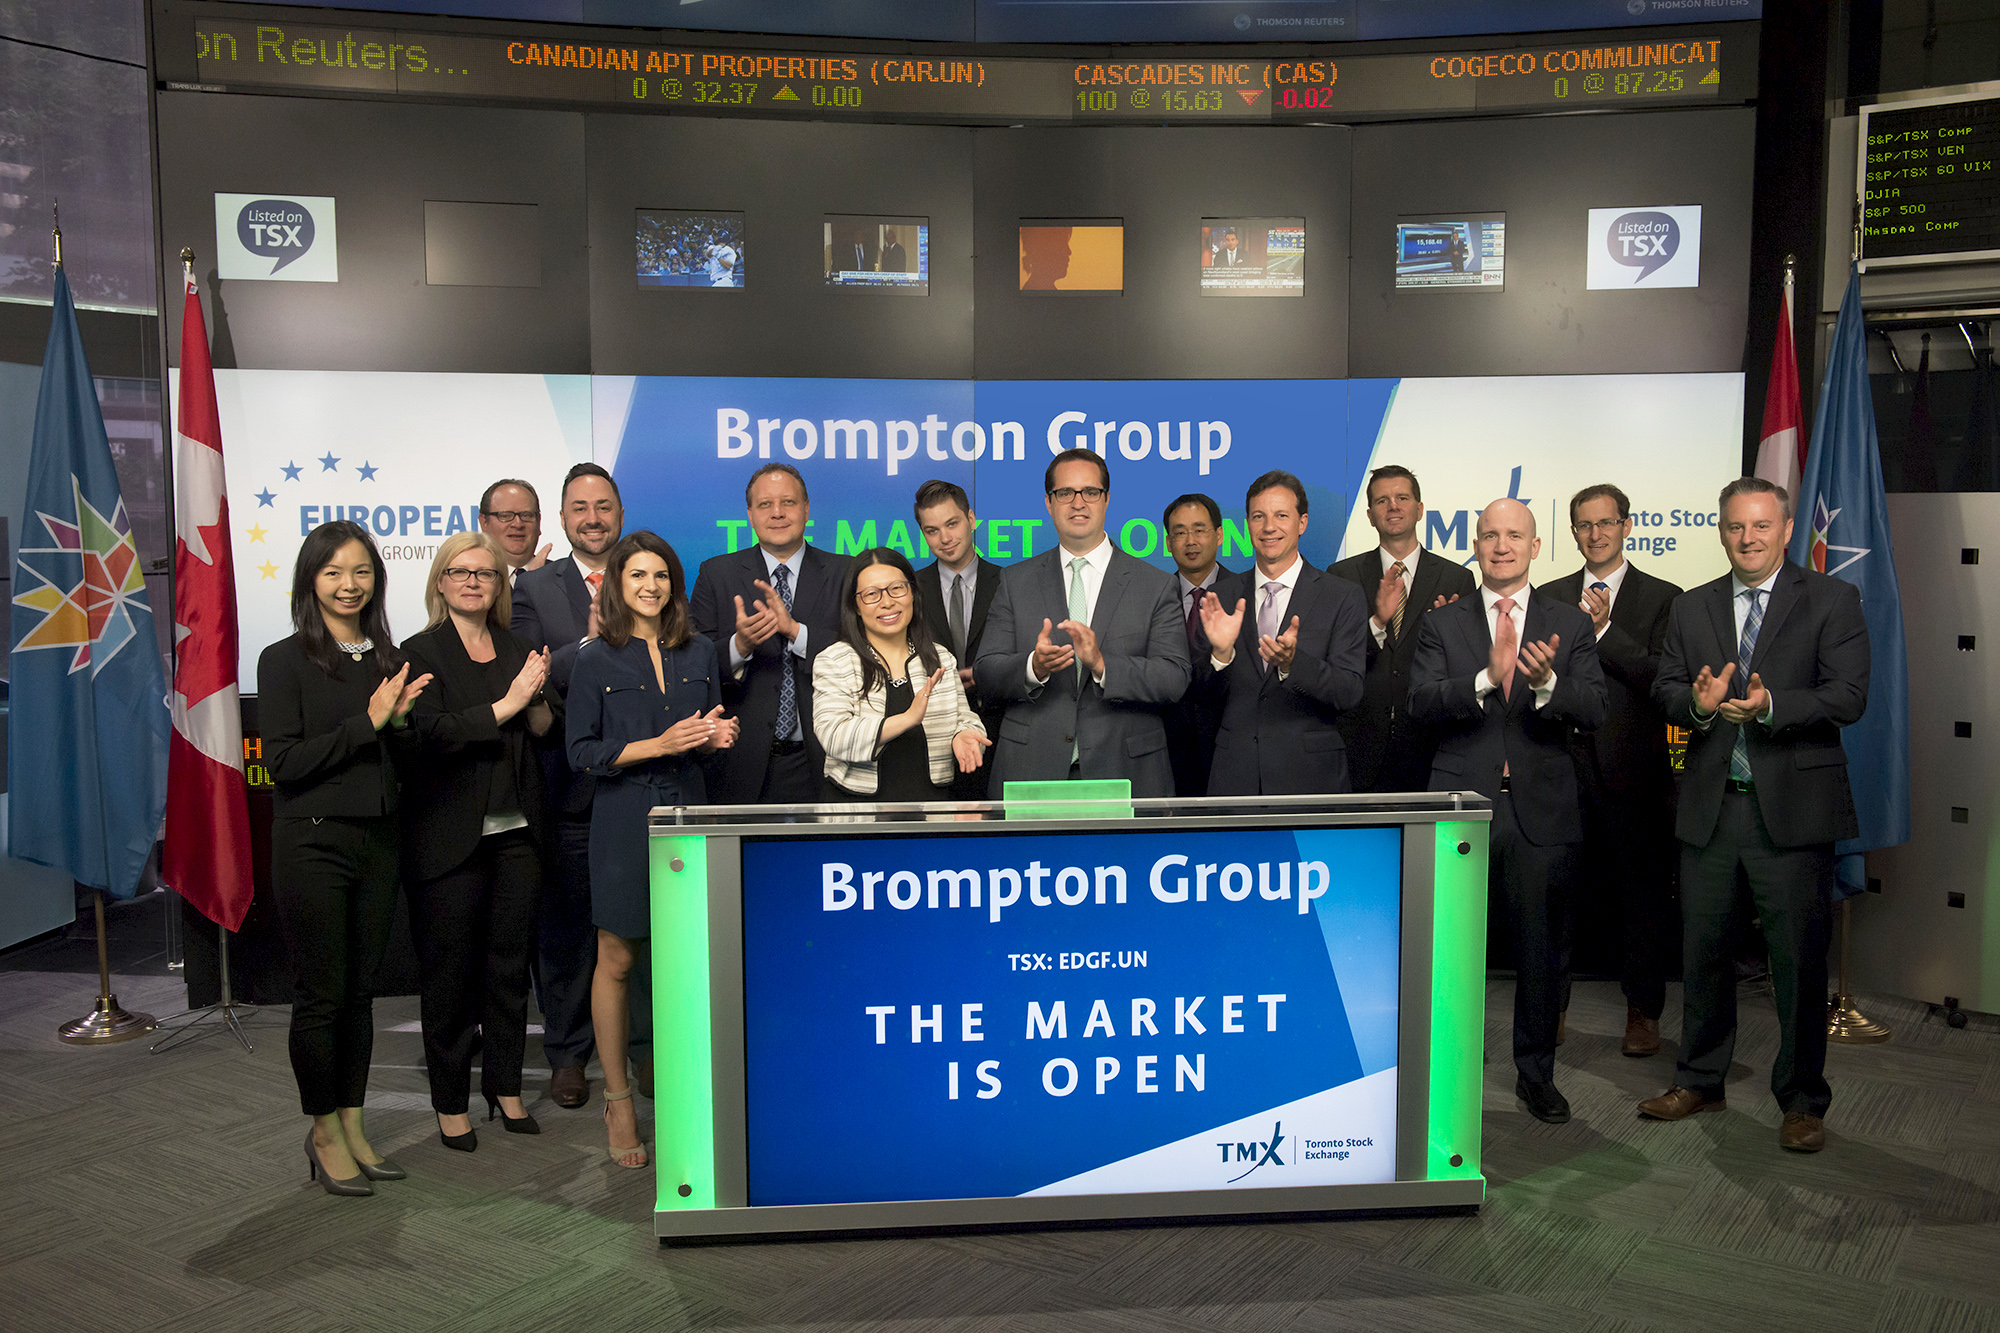 Tmx tsx tsxv news market opens brompton group opens the market biocorpaavc Images